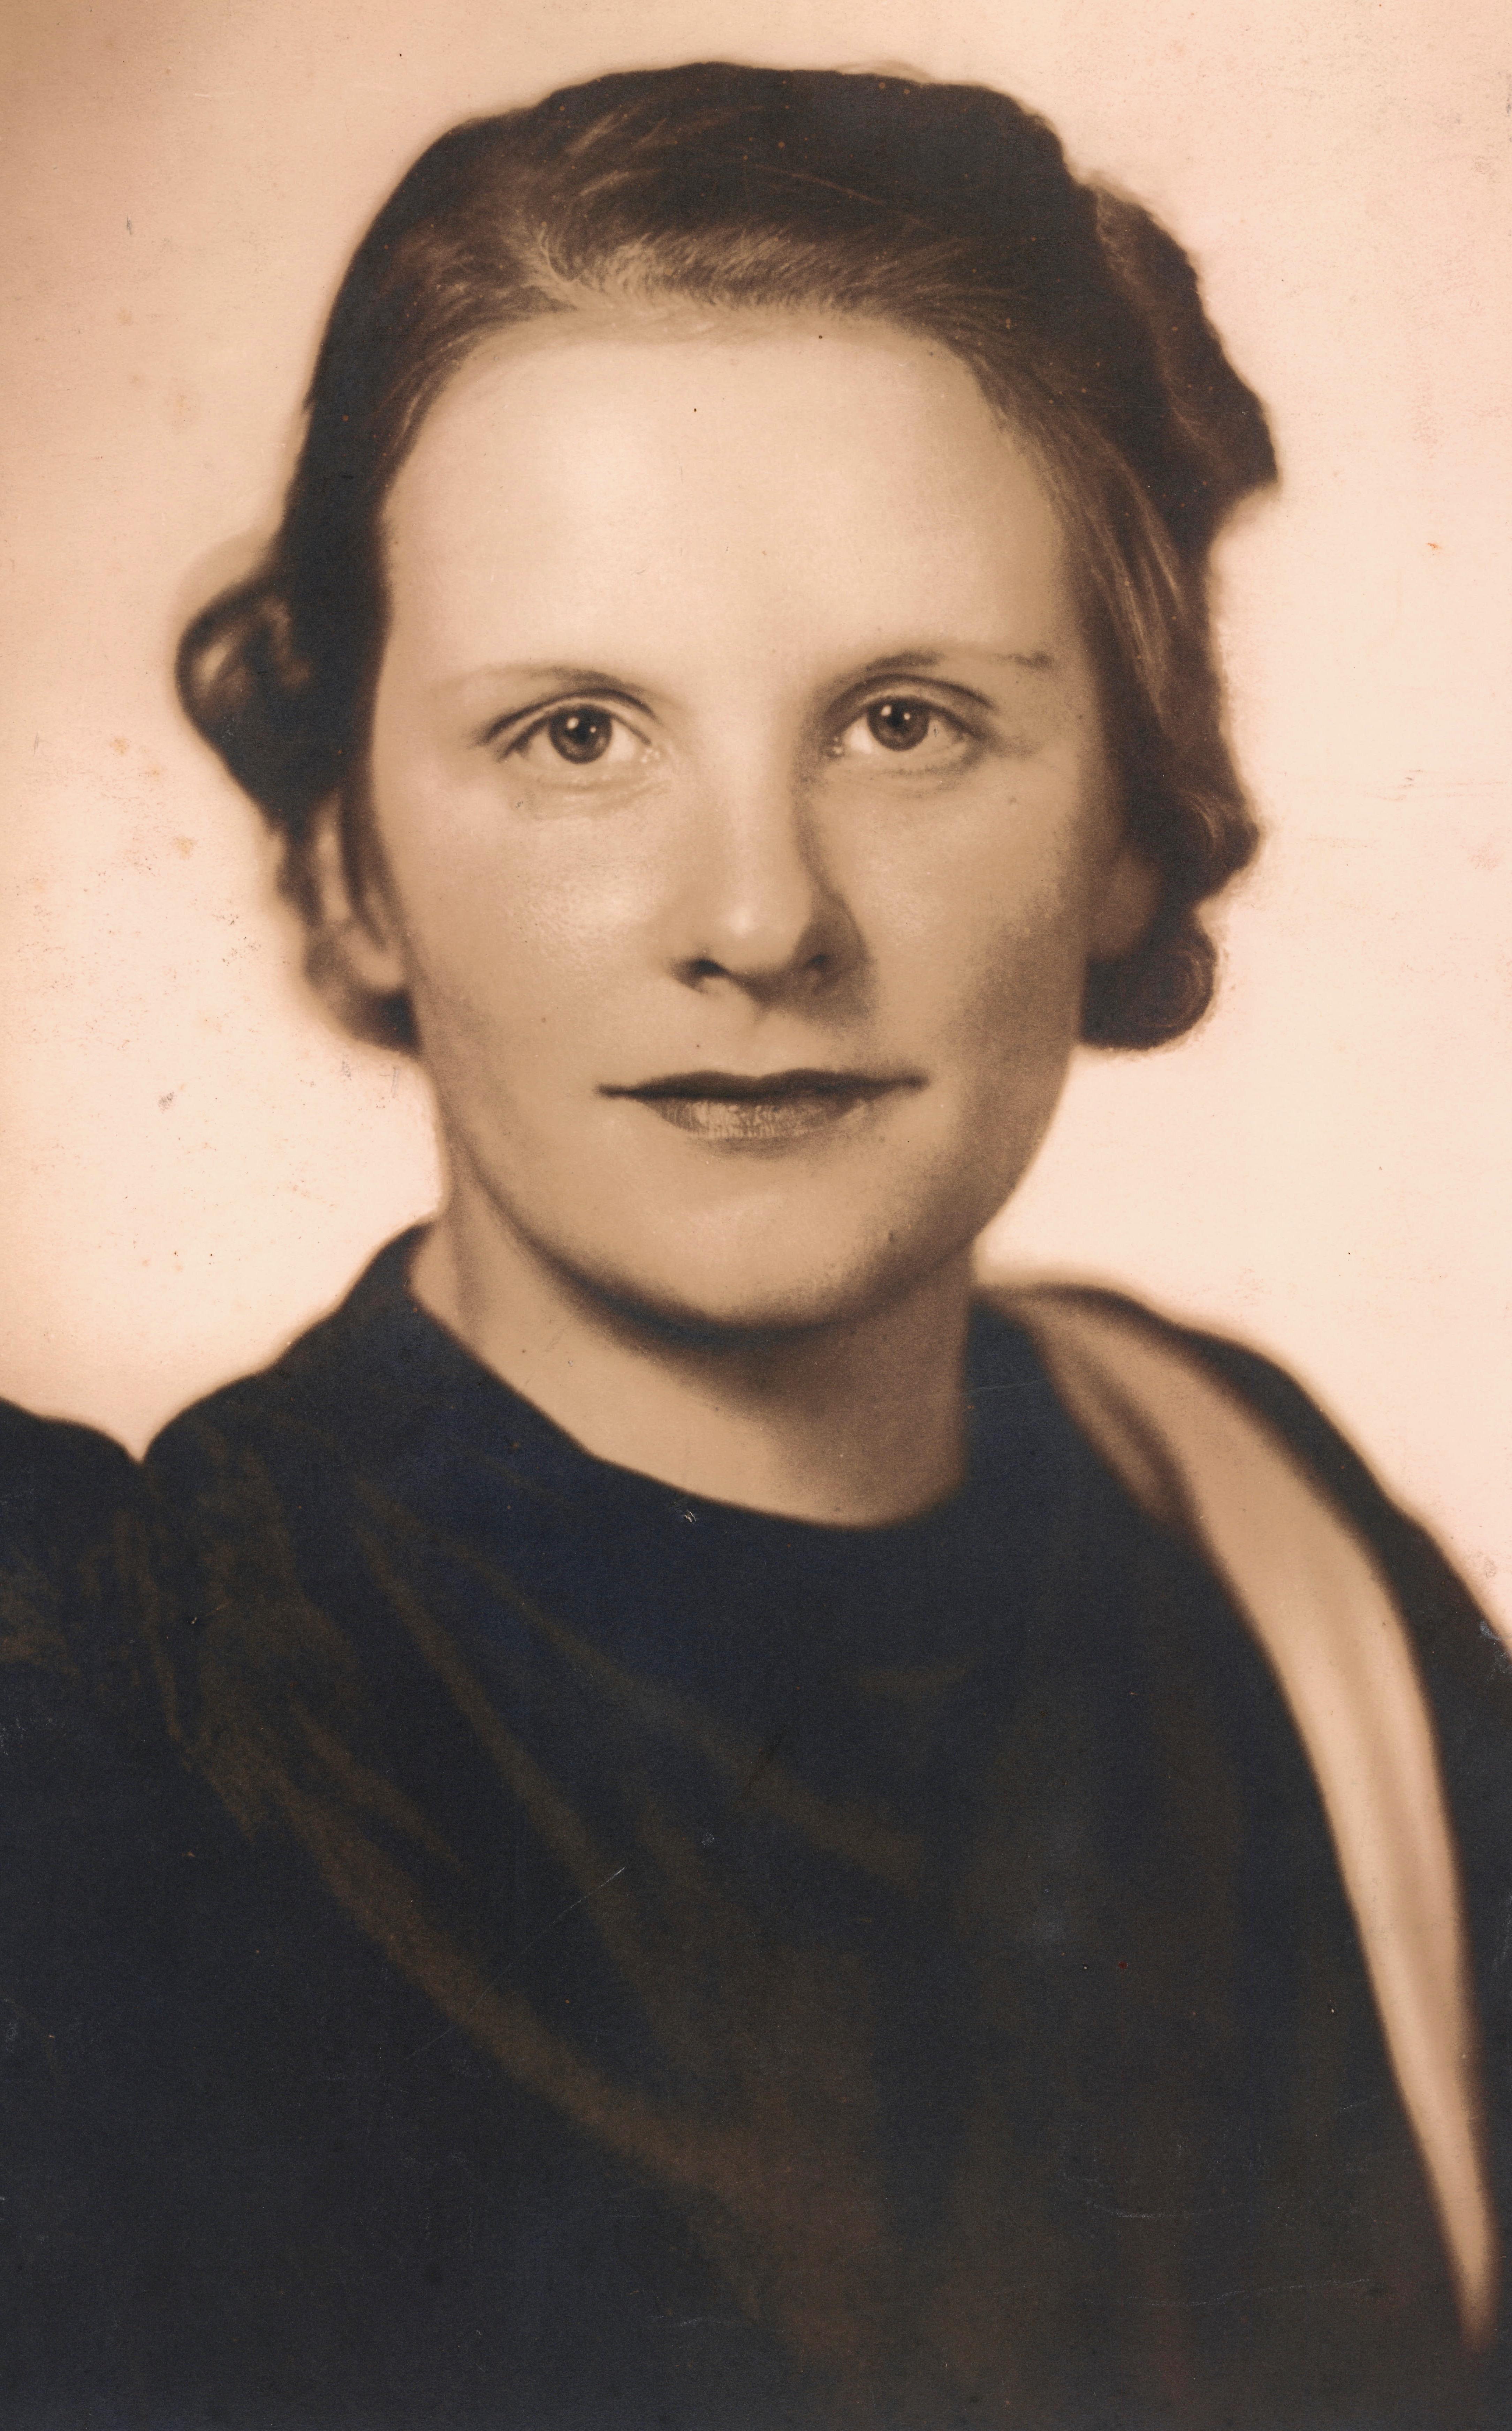 Denise de Chazal